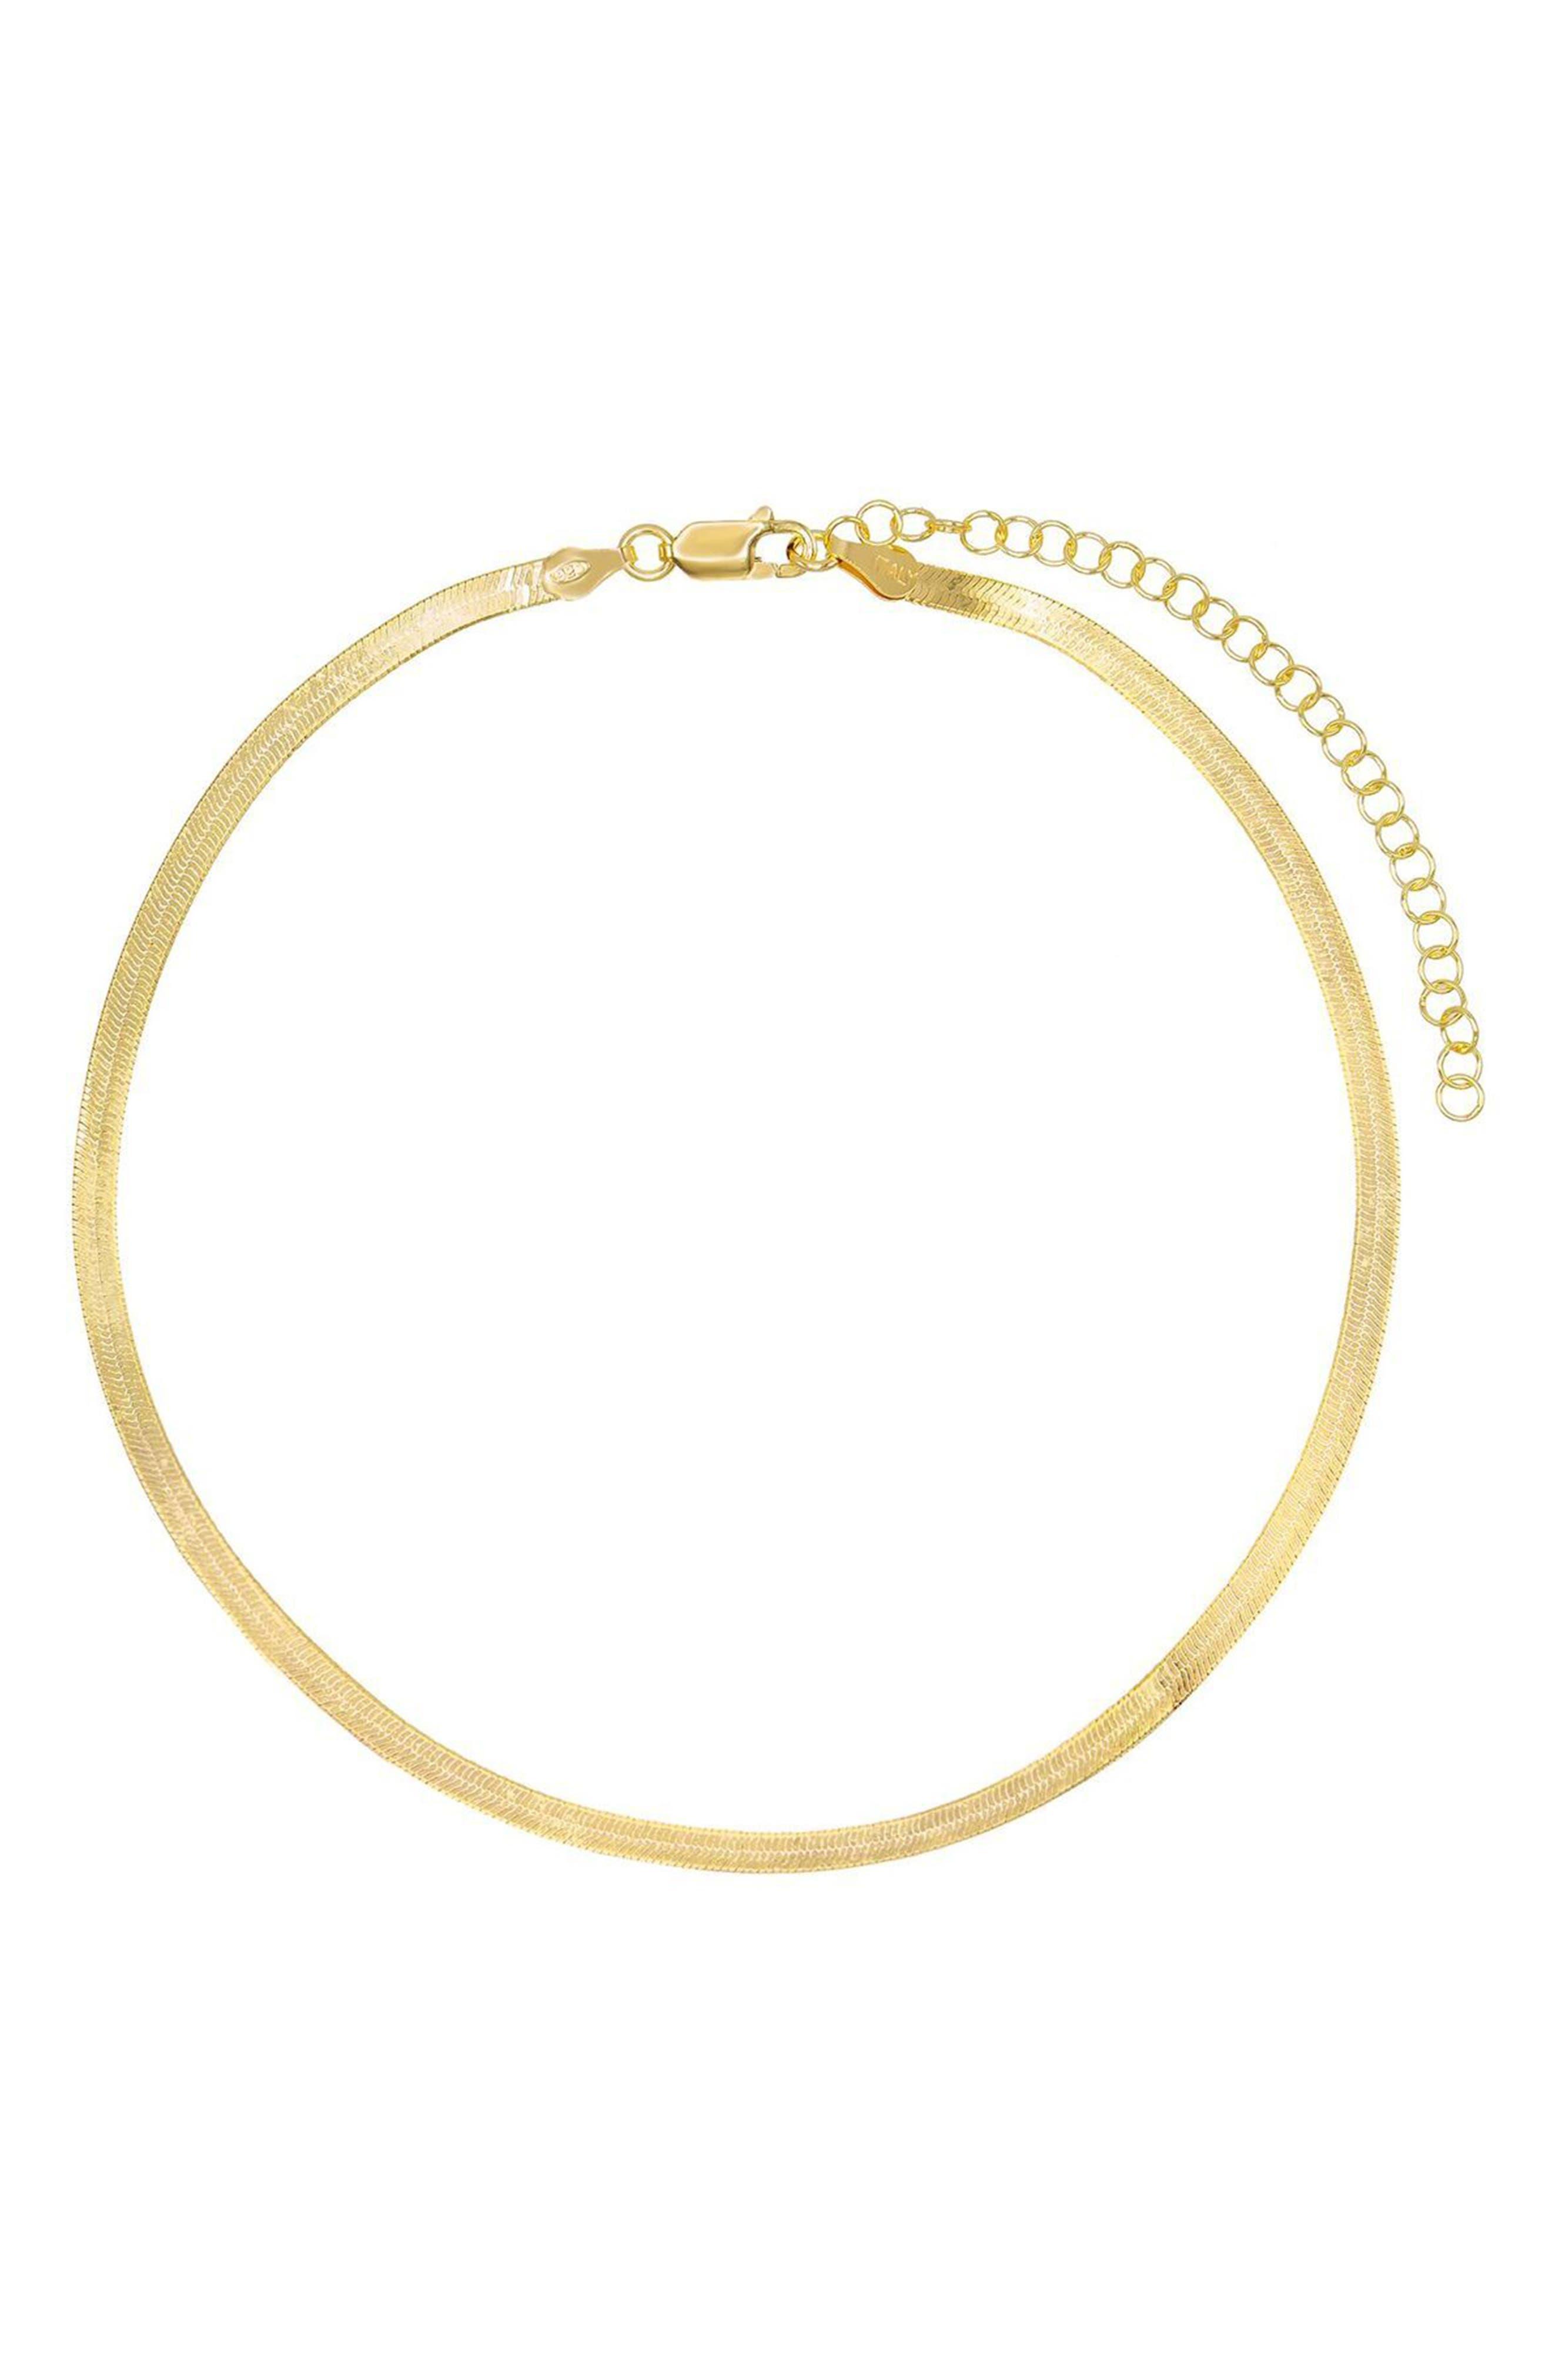 Women's Adina's Jewels Herringbone Chain Choker